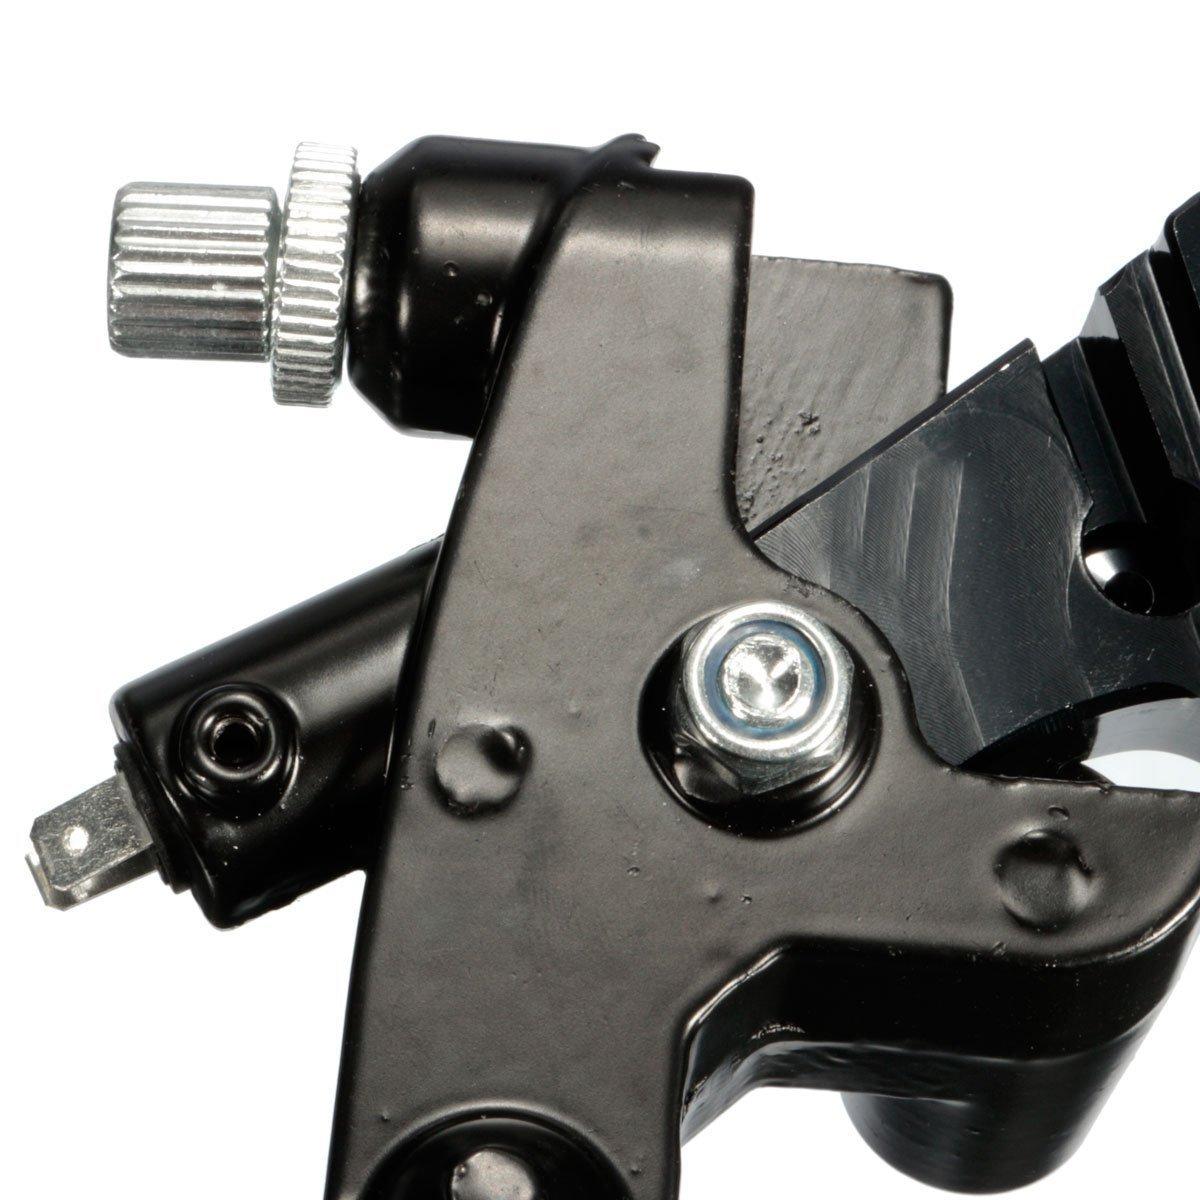 Universal Motorcycle Adjustment Front Brake Master Cylinder Clutch Lever For Sport Bike//Street Bike//Scooter red Dirt Bike With 7//8 22mm Standard Handle Bar.